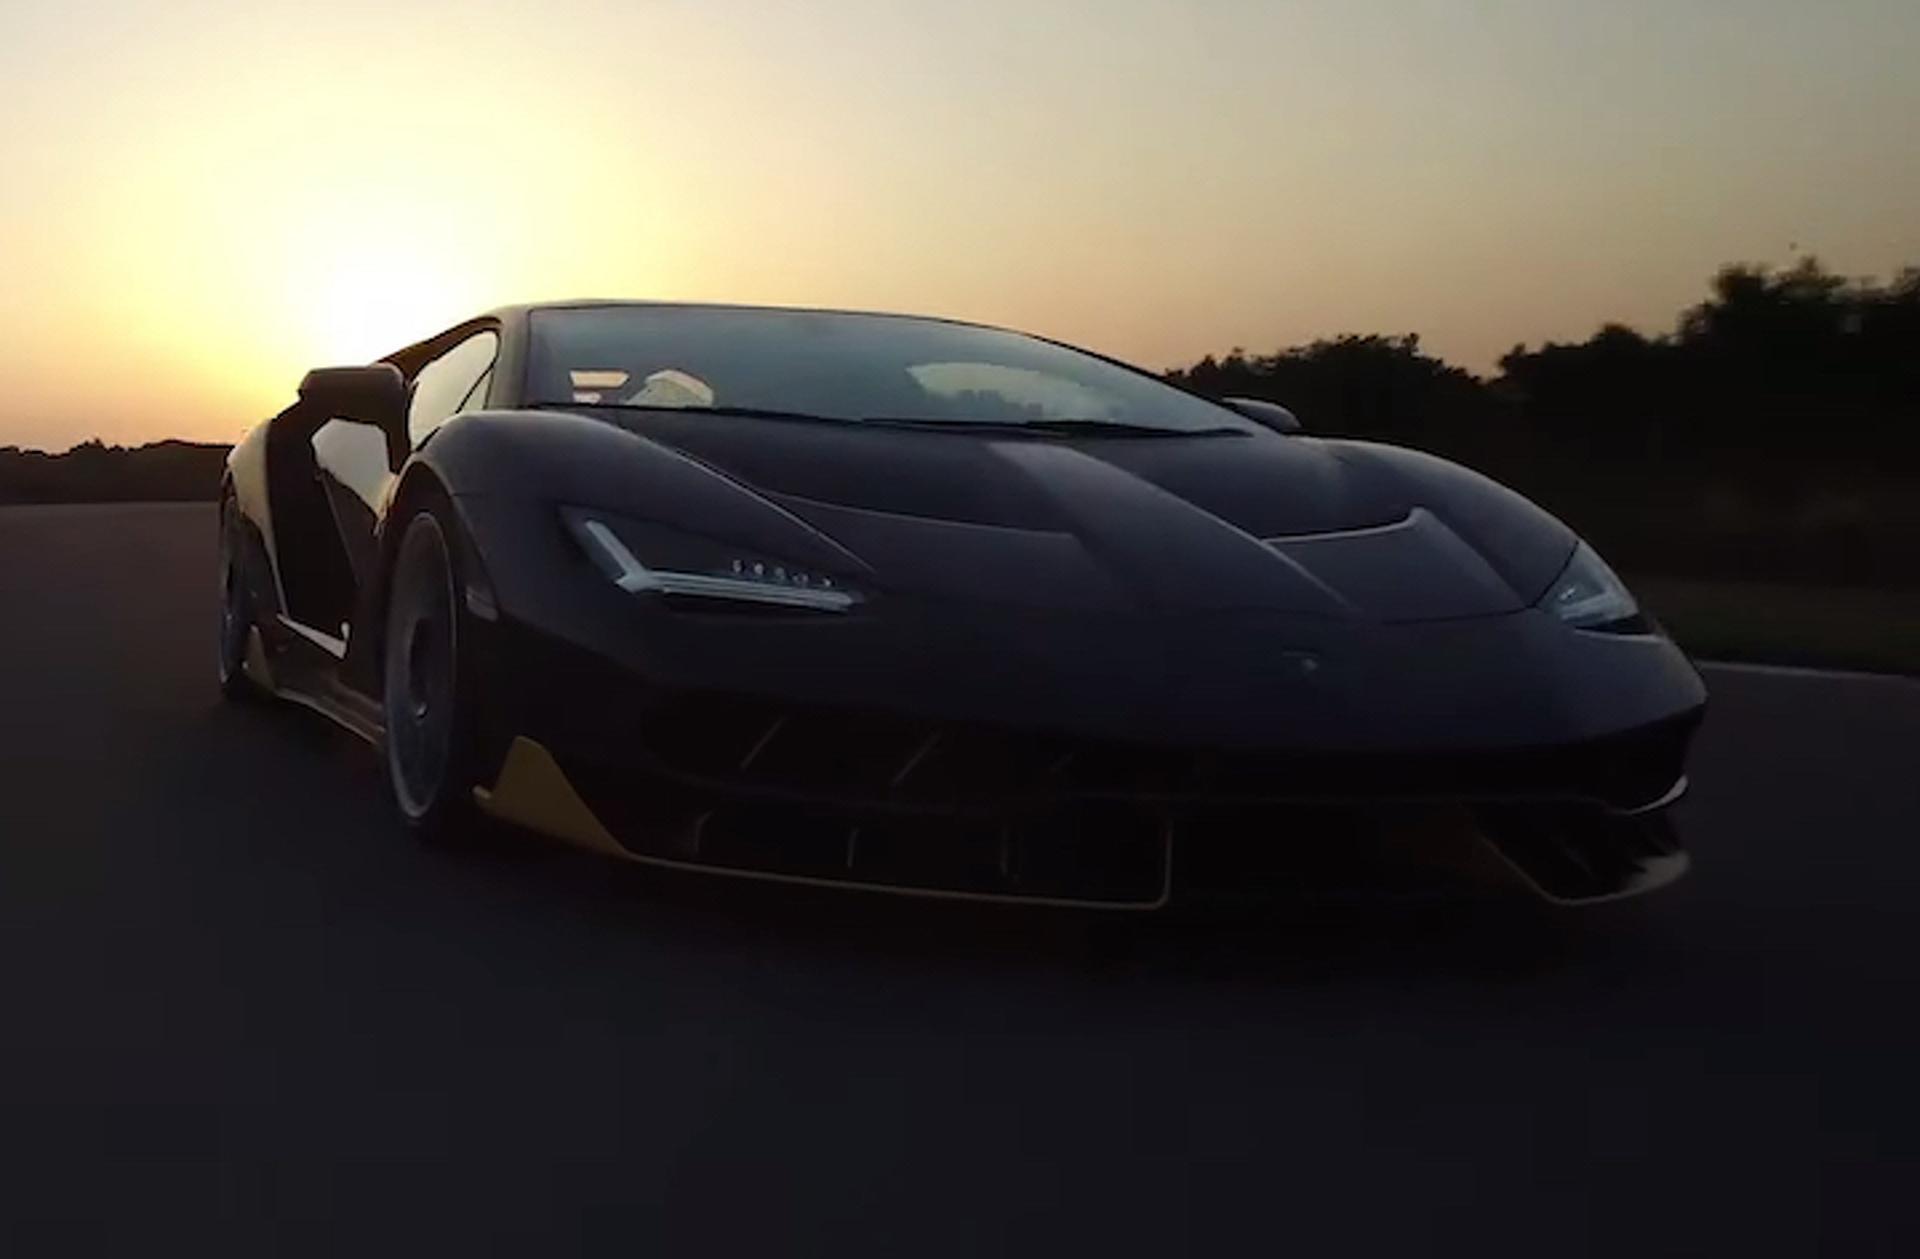 Lamborghini Centenario Goes Hard at the Nardo Ring